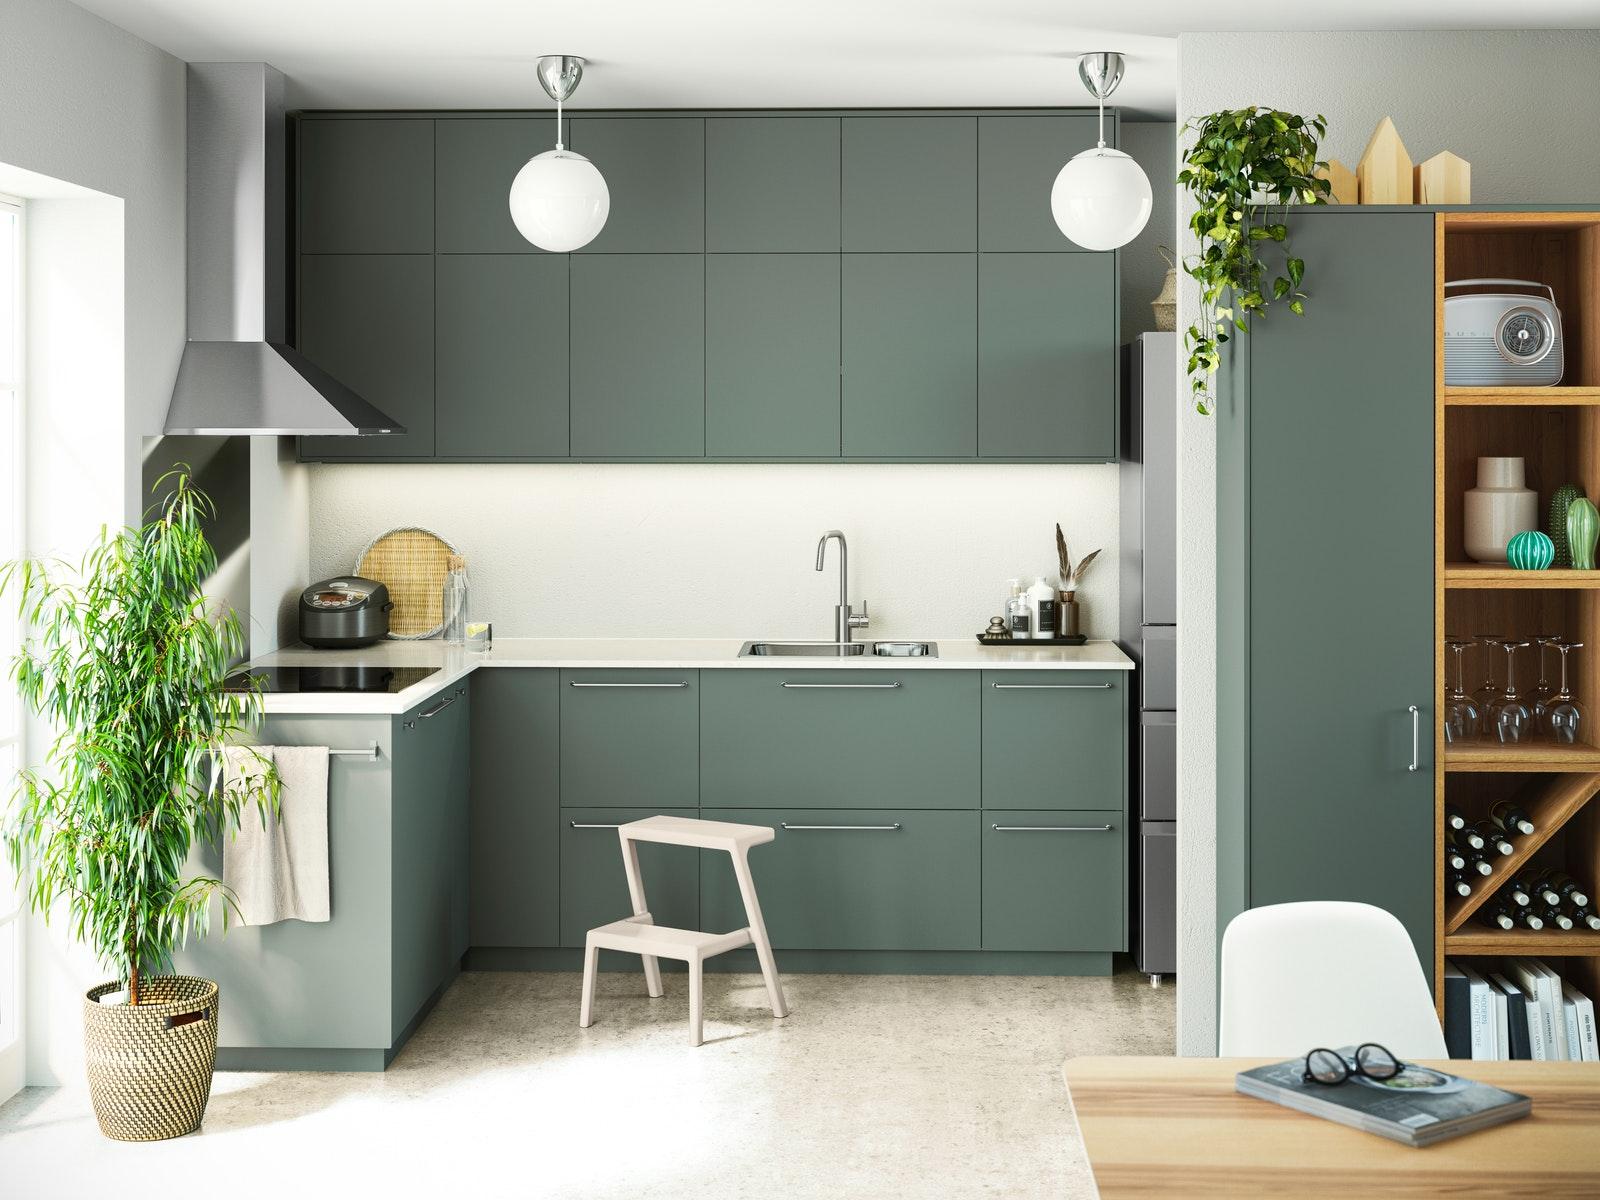 Minimalist Kitchen Set Design For 2020 Ikea Indonesia